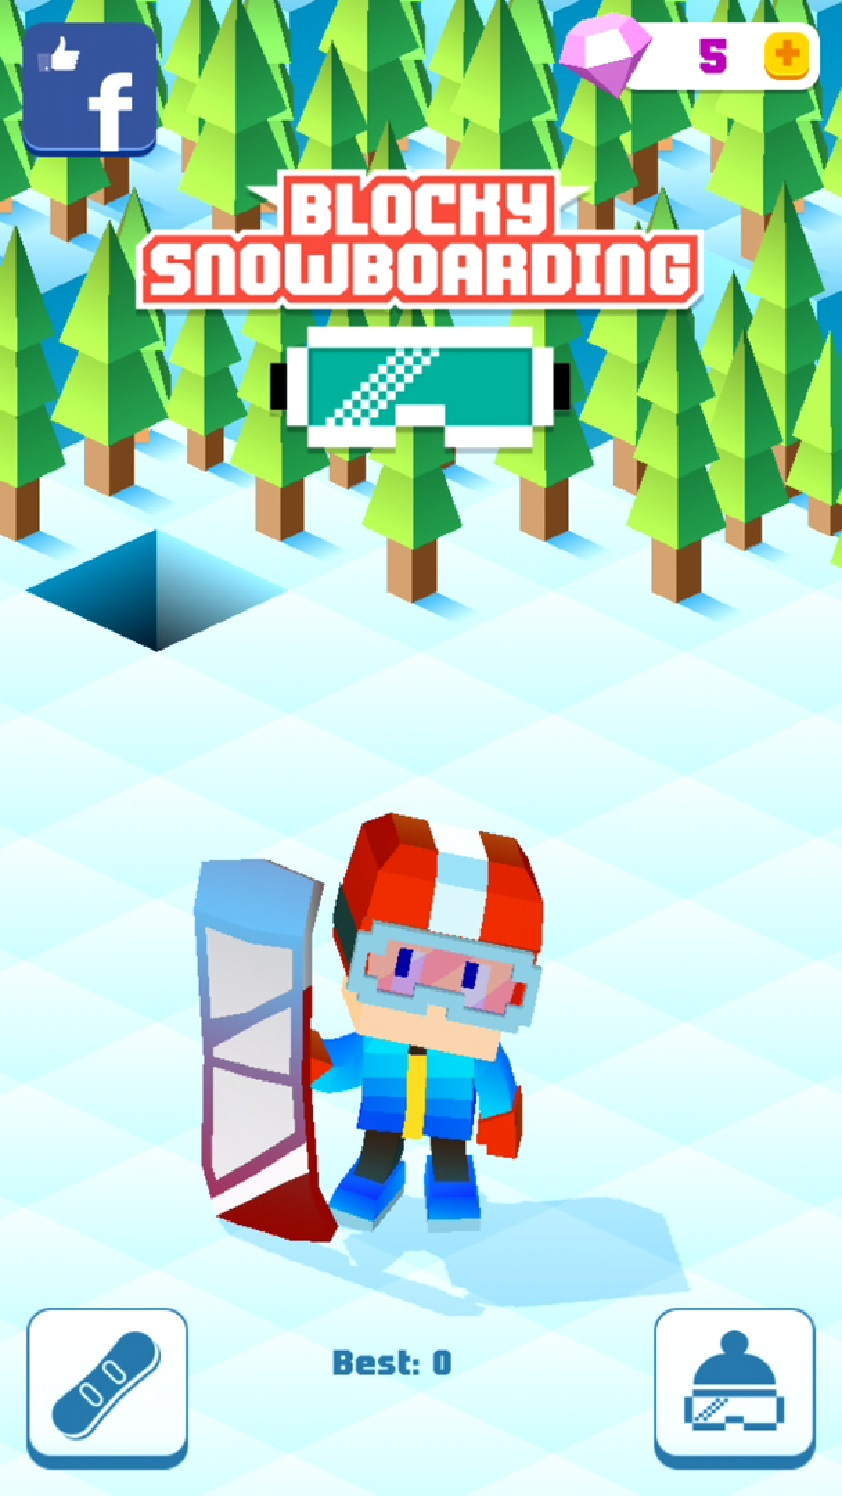 androidアプリ Blocky Snowboarding攻略スクリーンショット1